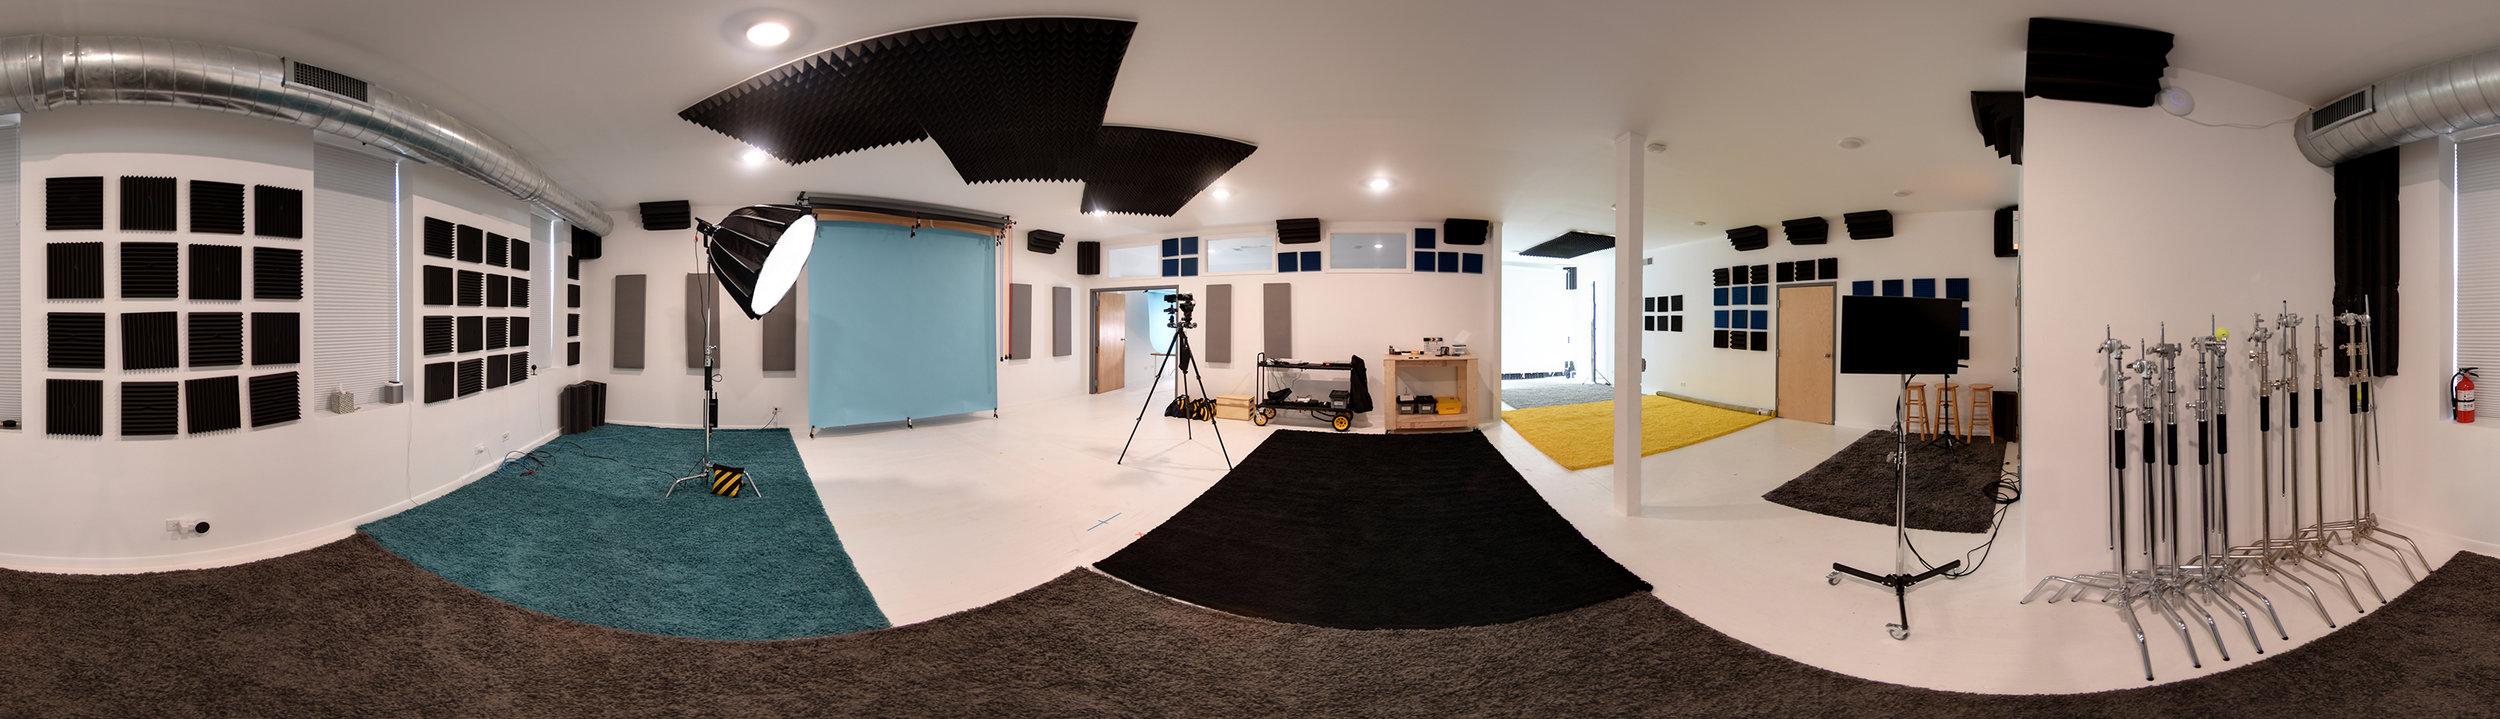 StudioPano.jpg